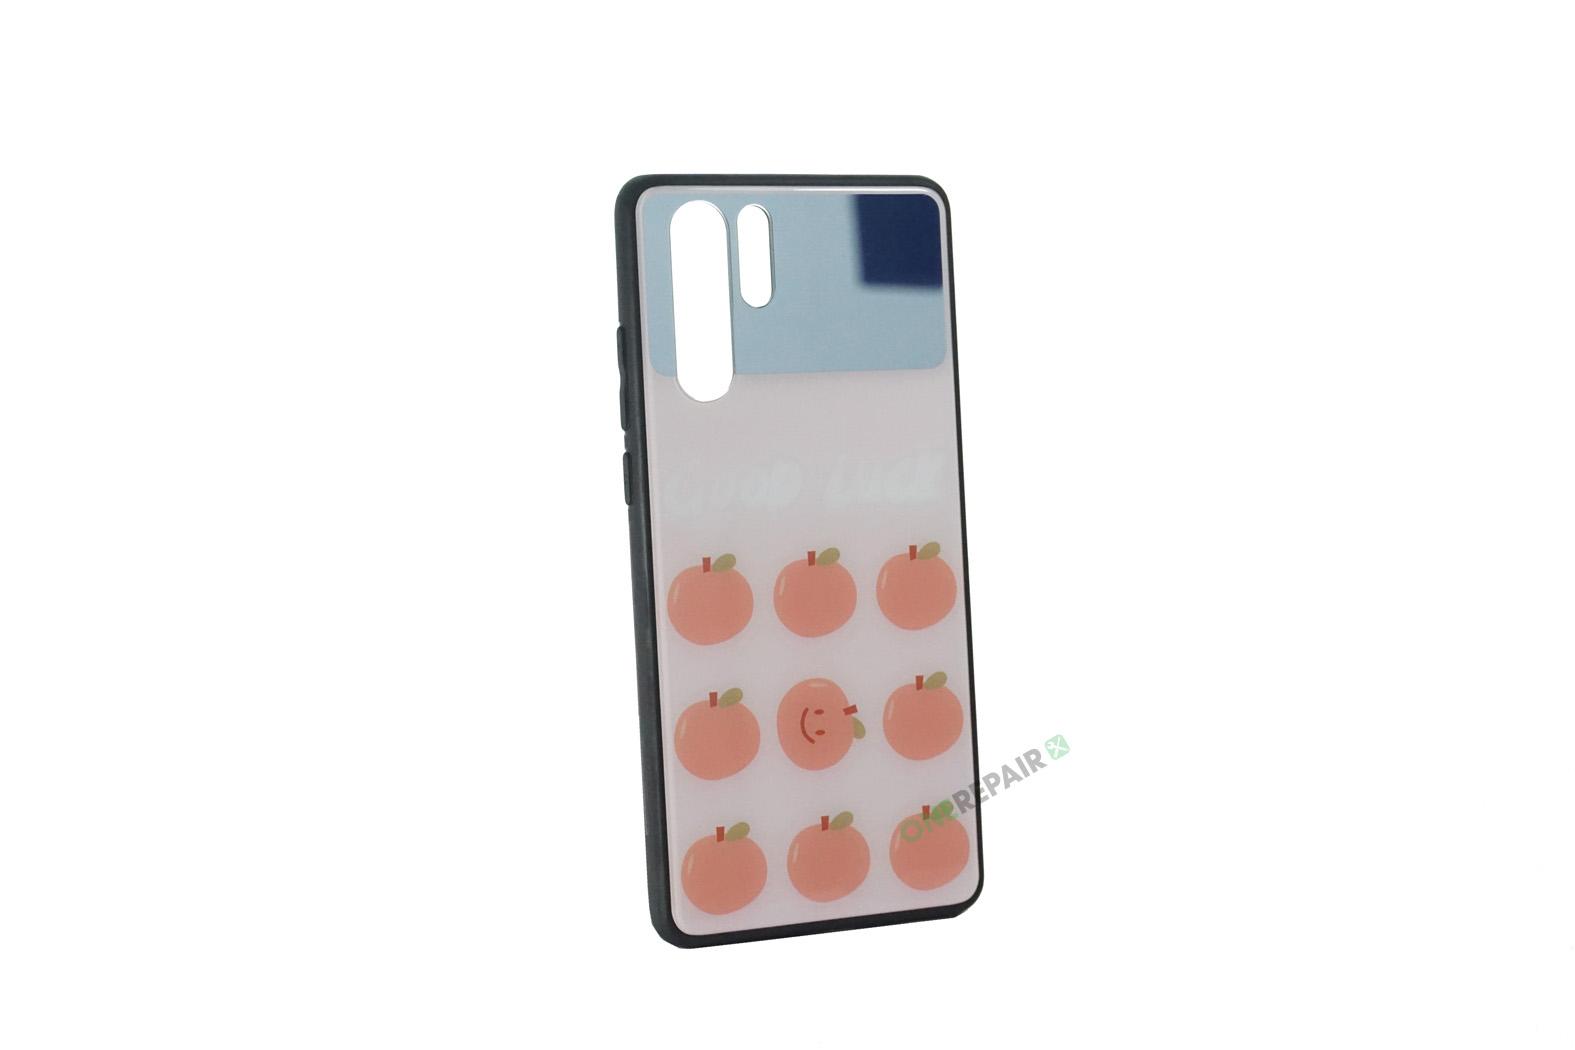 353532_Huawei_P30_Pro_Appelsin_Cover_Pink_Spejl_OneRepair_00002